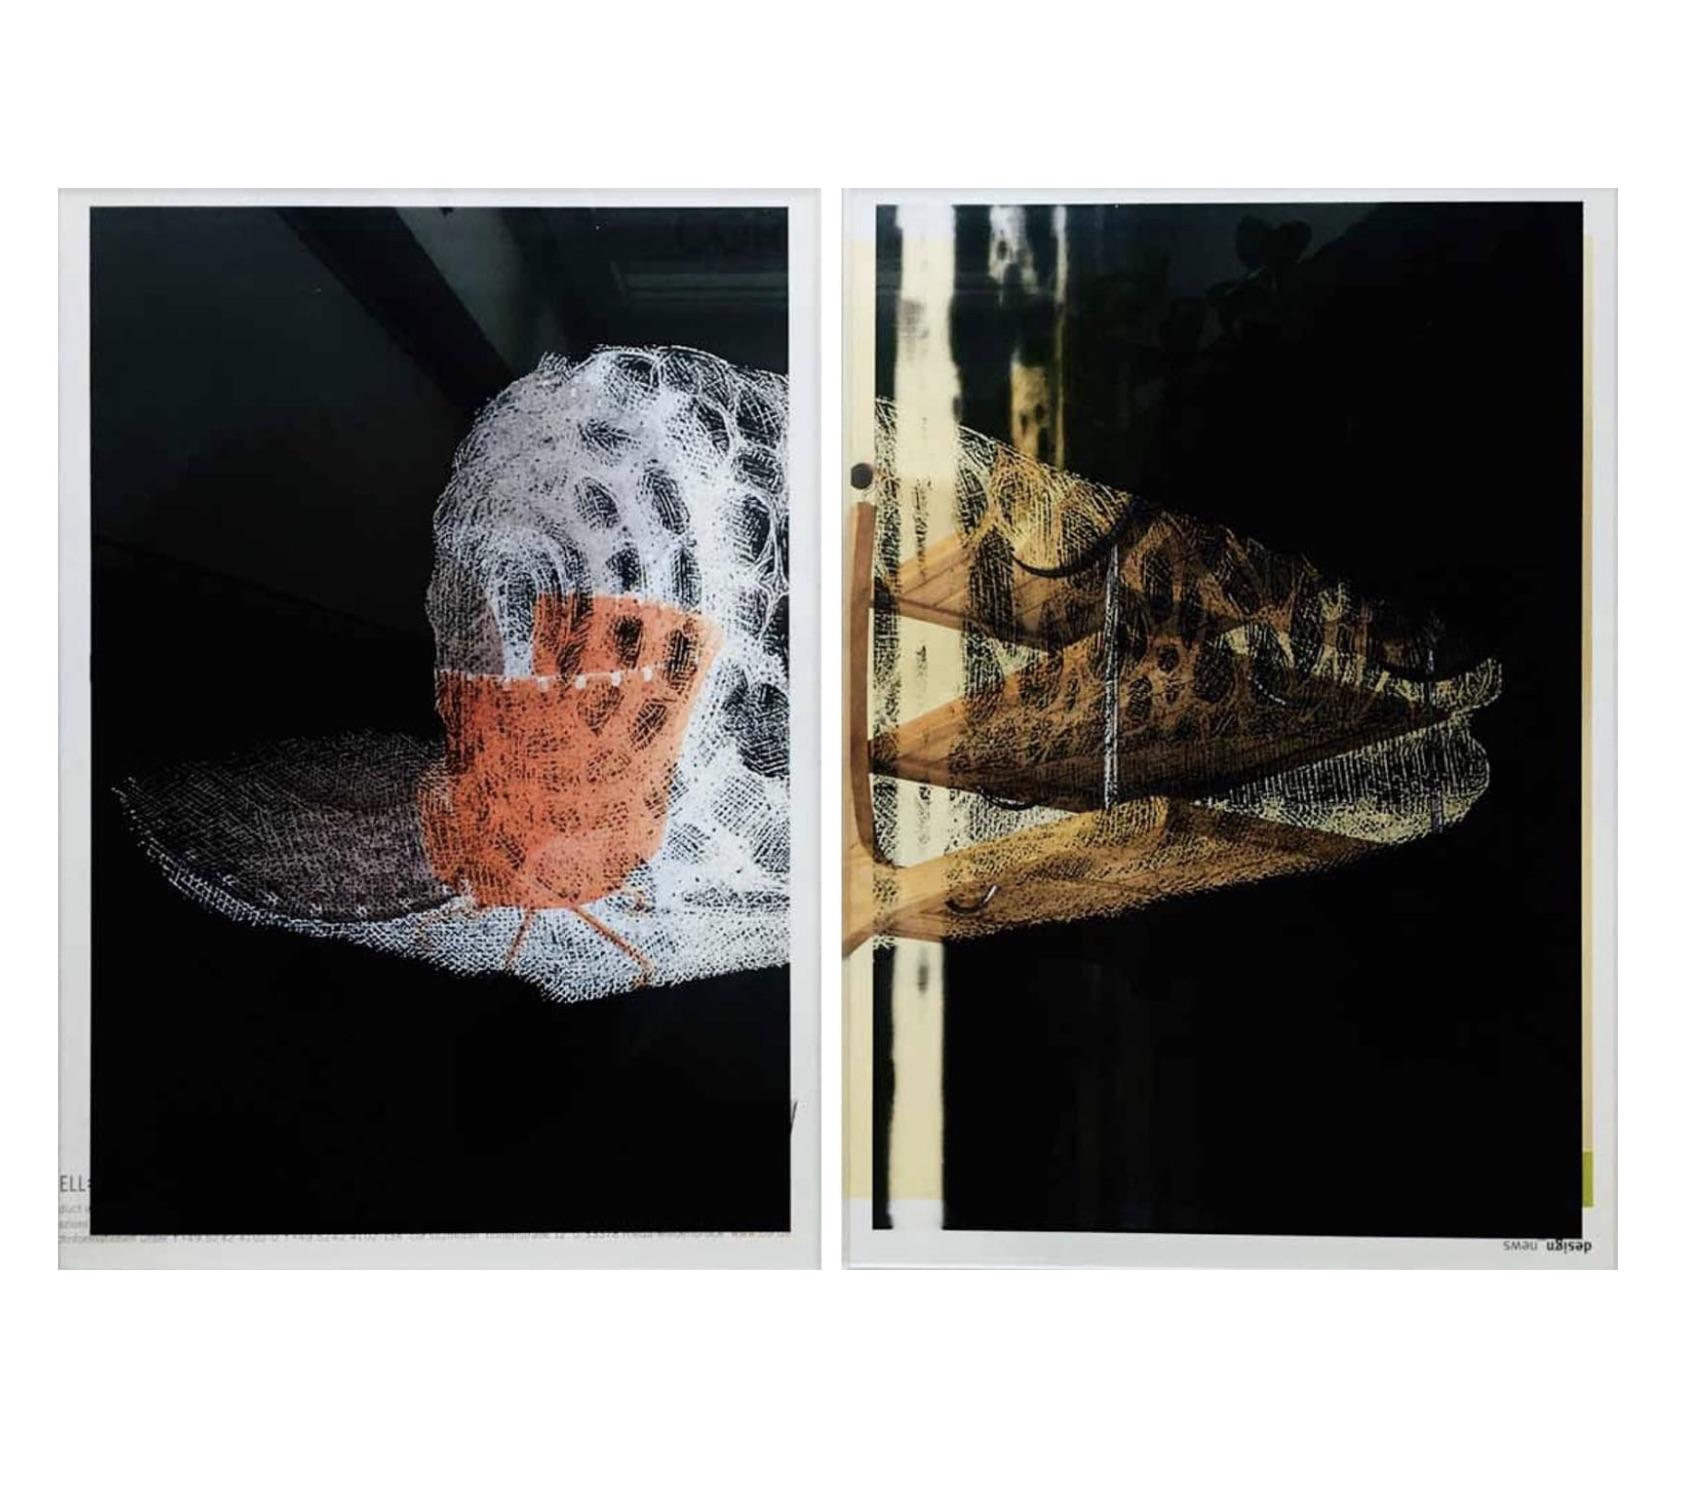 arye wachsmuth, artist, political , conceptual